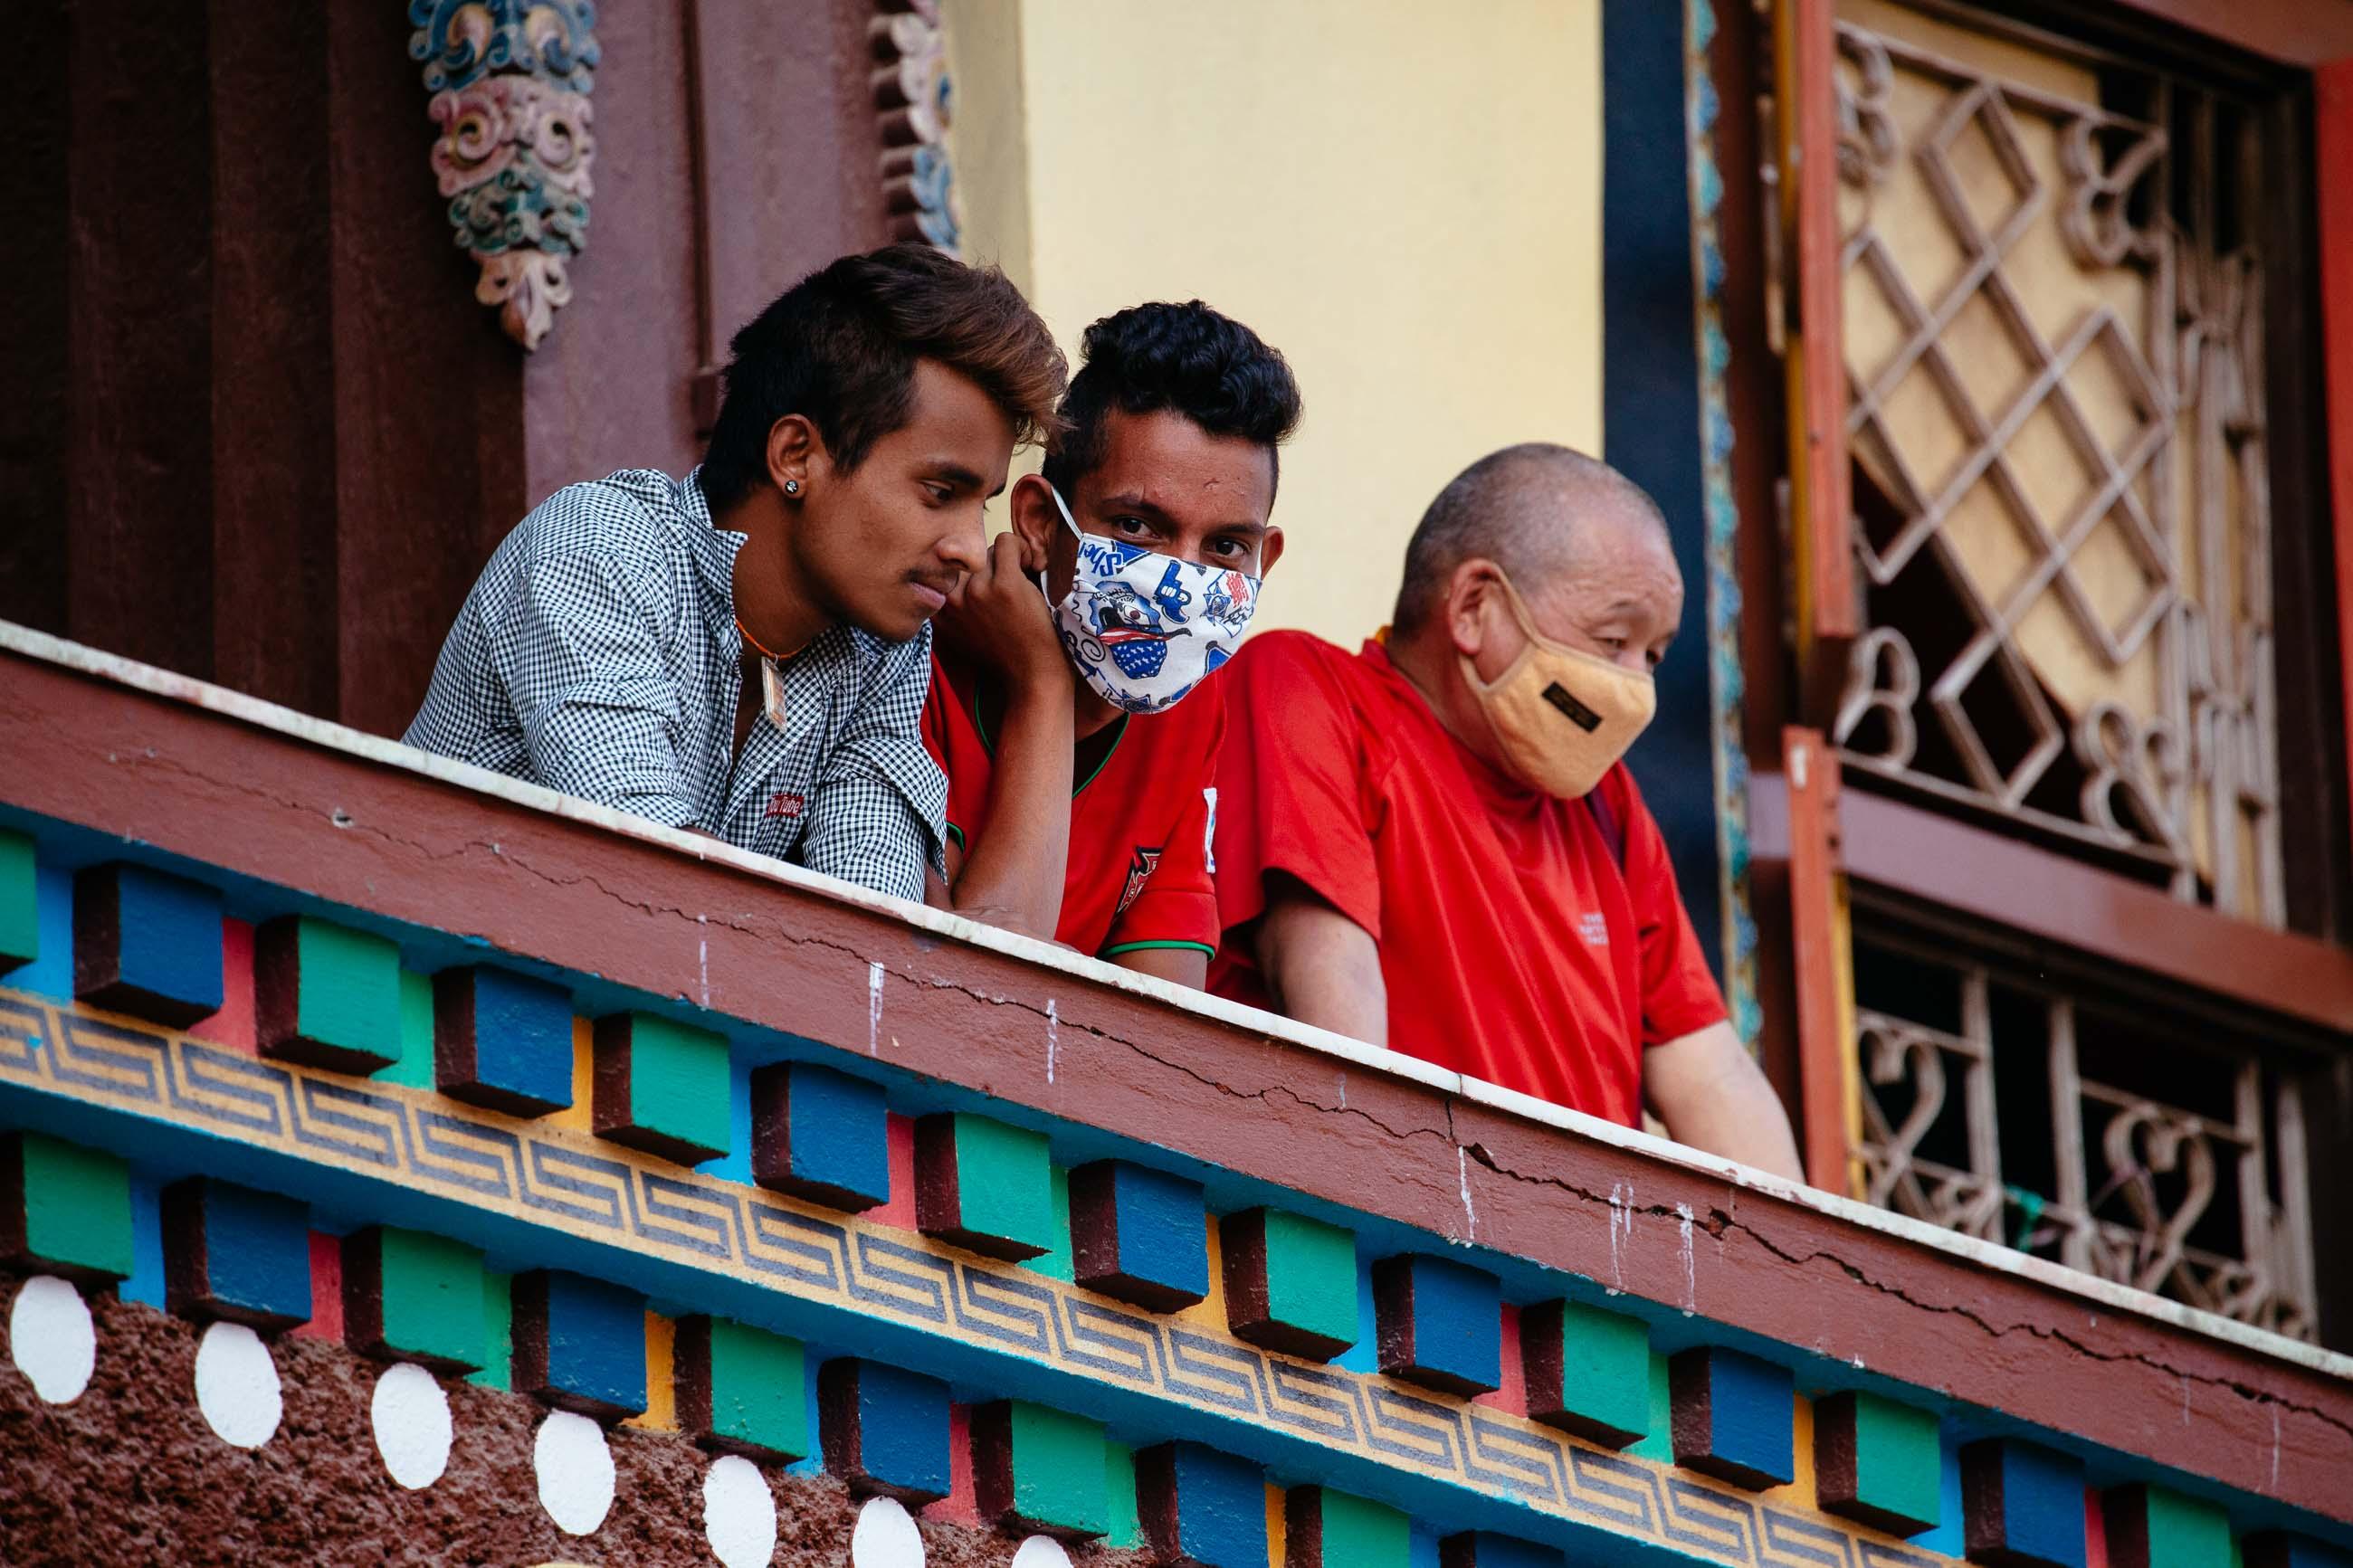 Kathmandu Police, Nepal Jun 2015